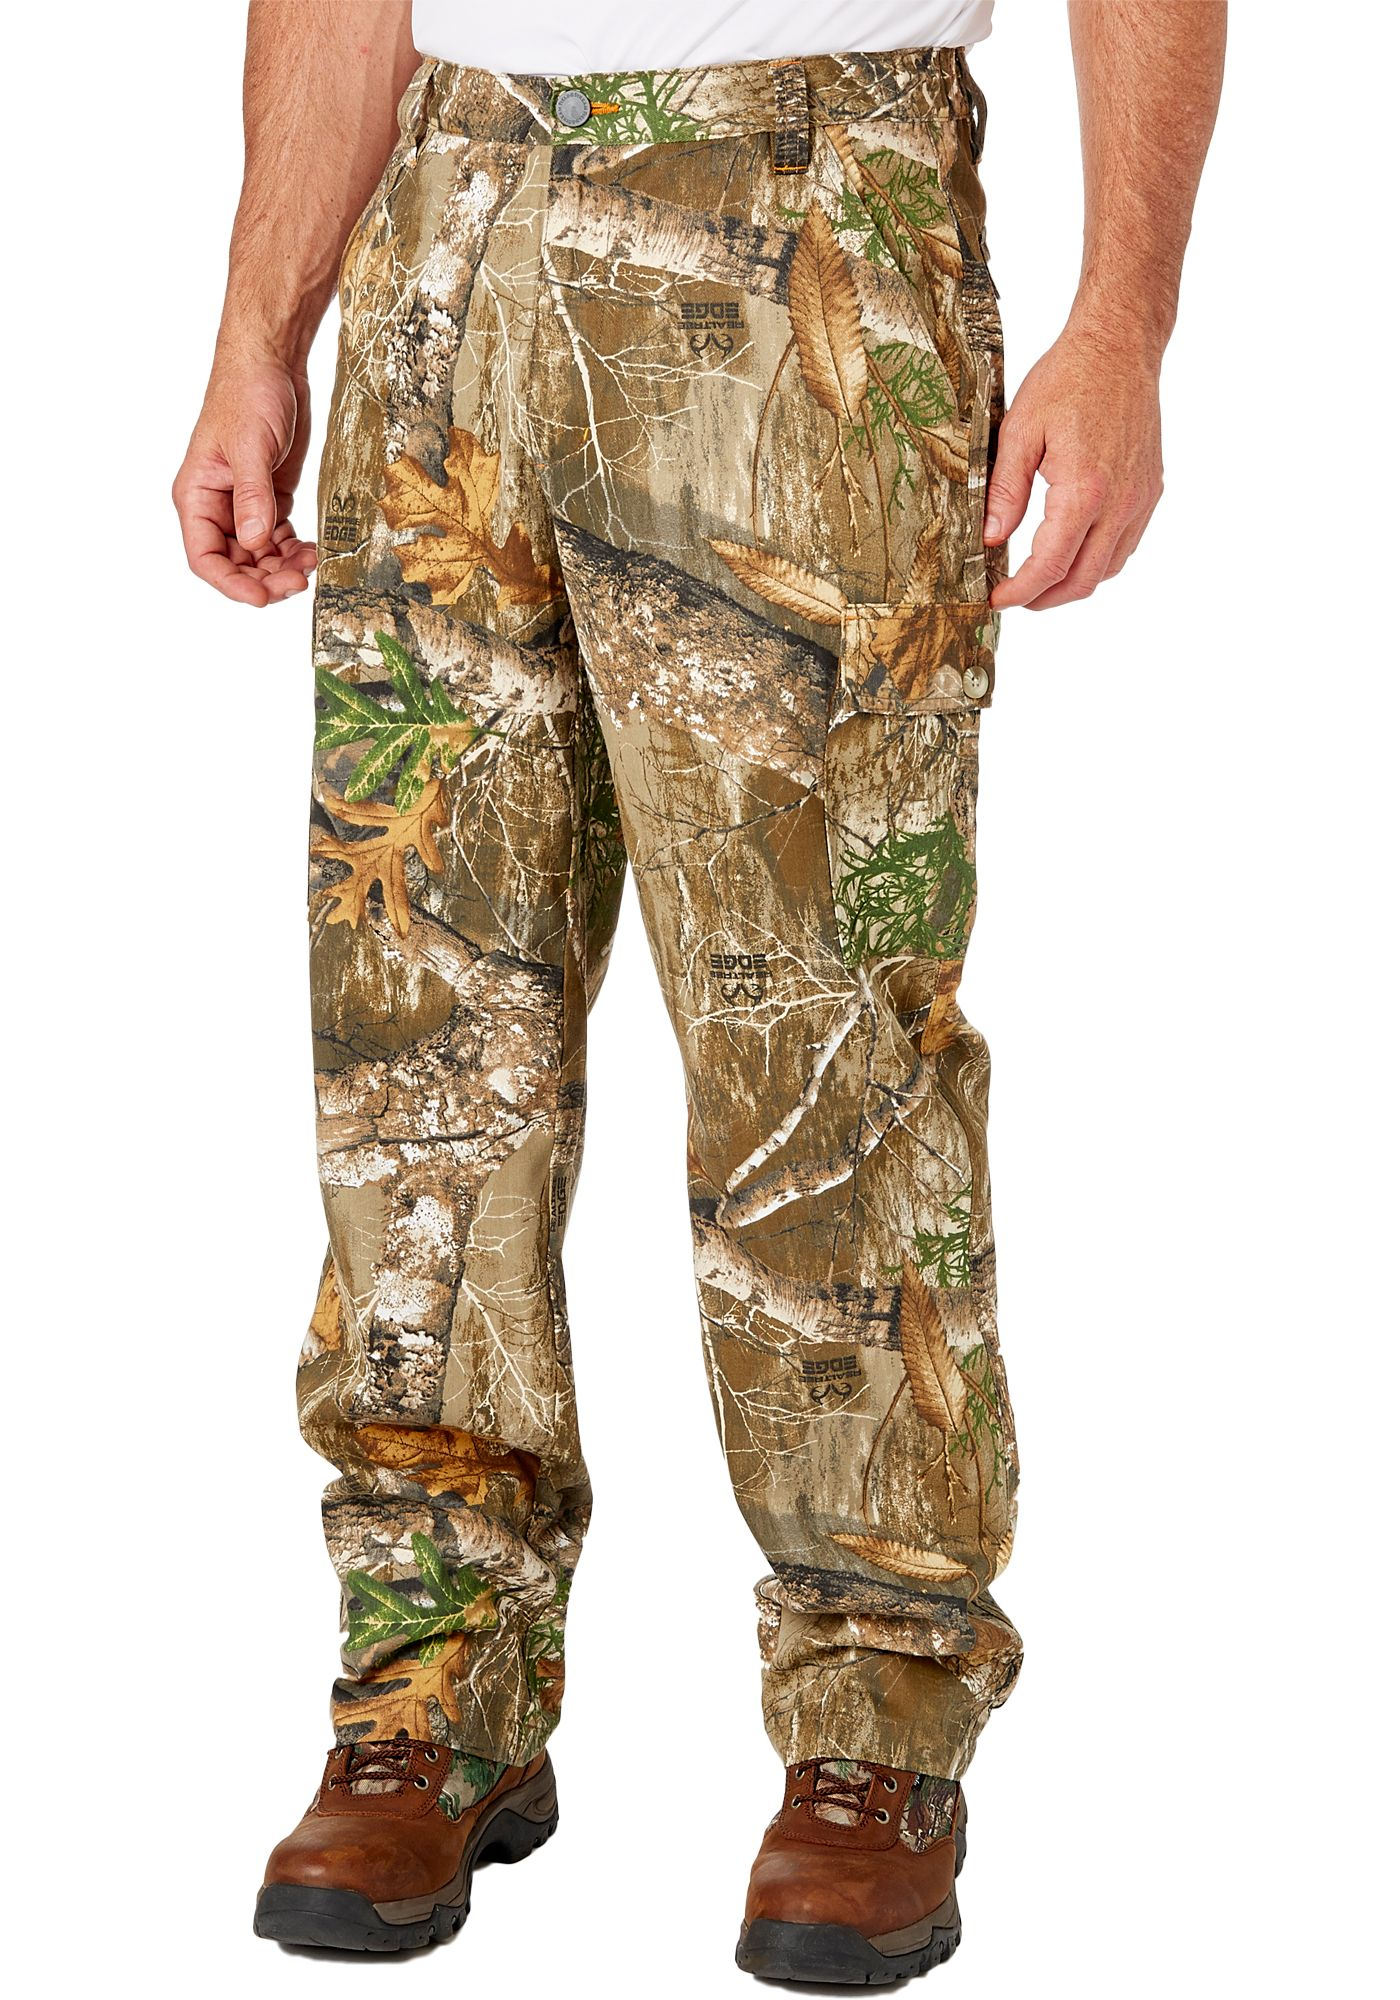 Field & Stream Men's Cotton Twill Pants